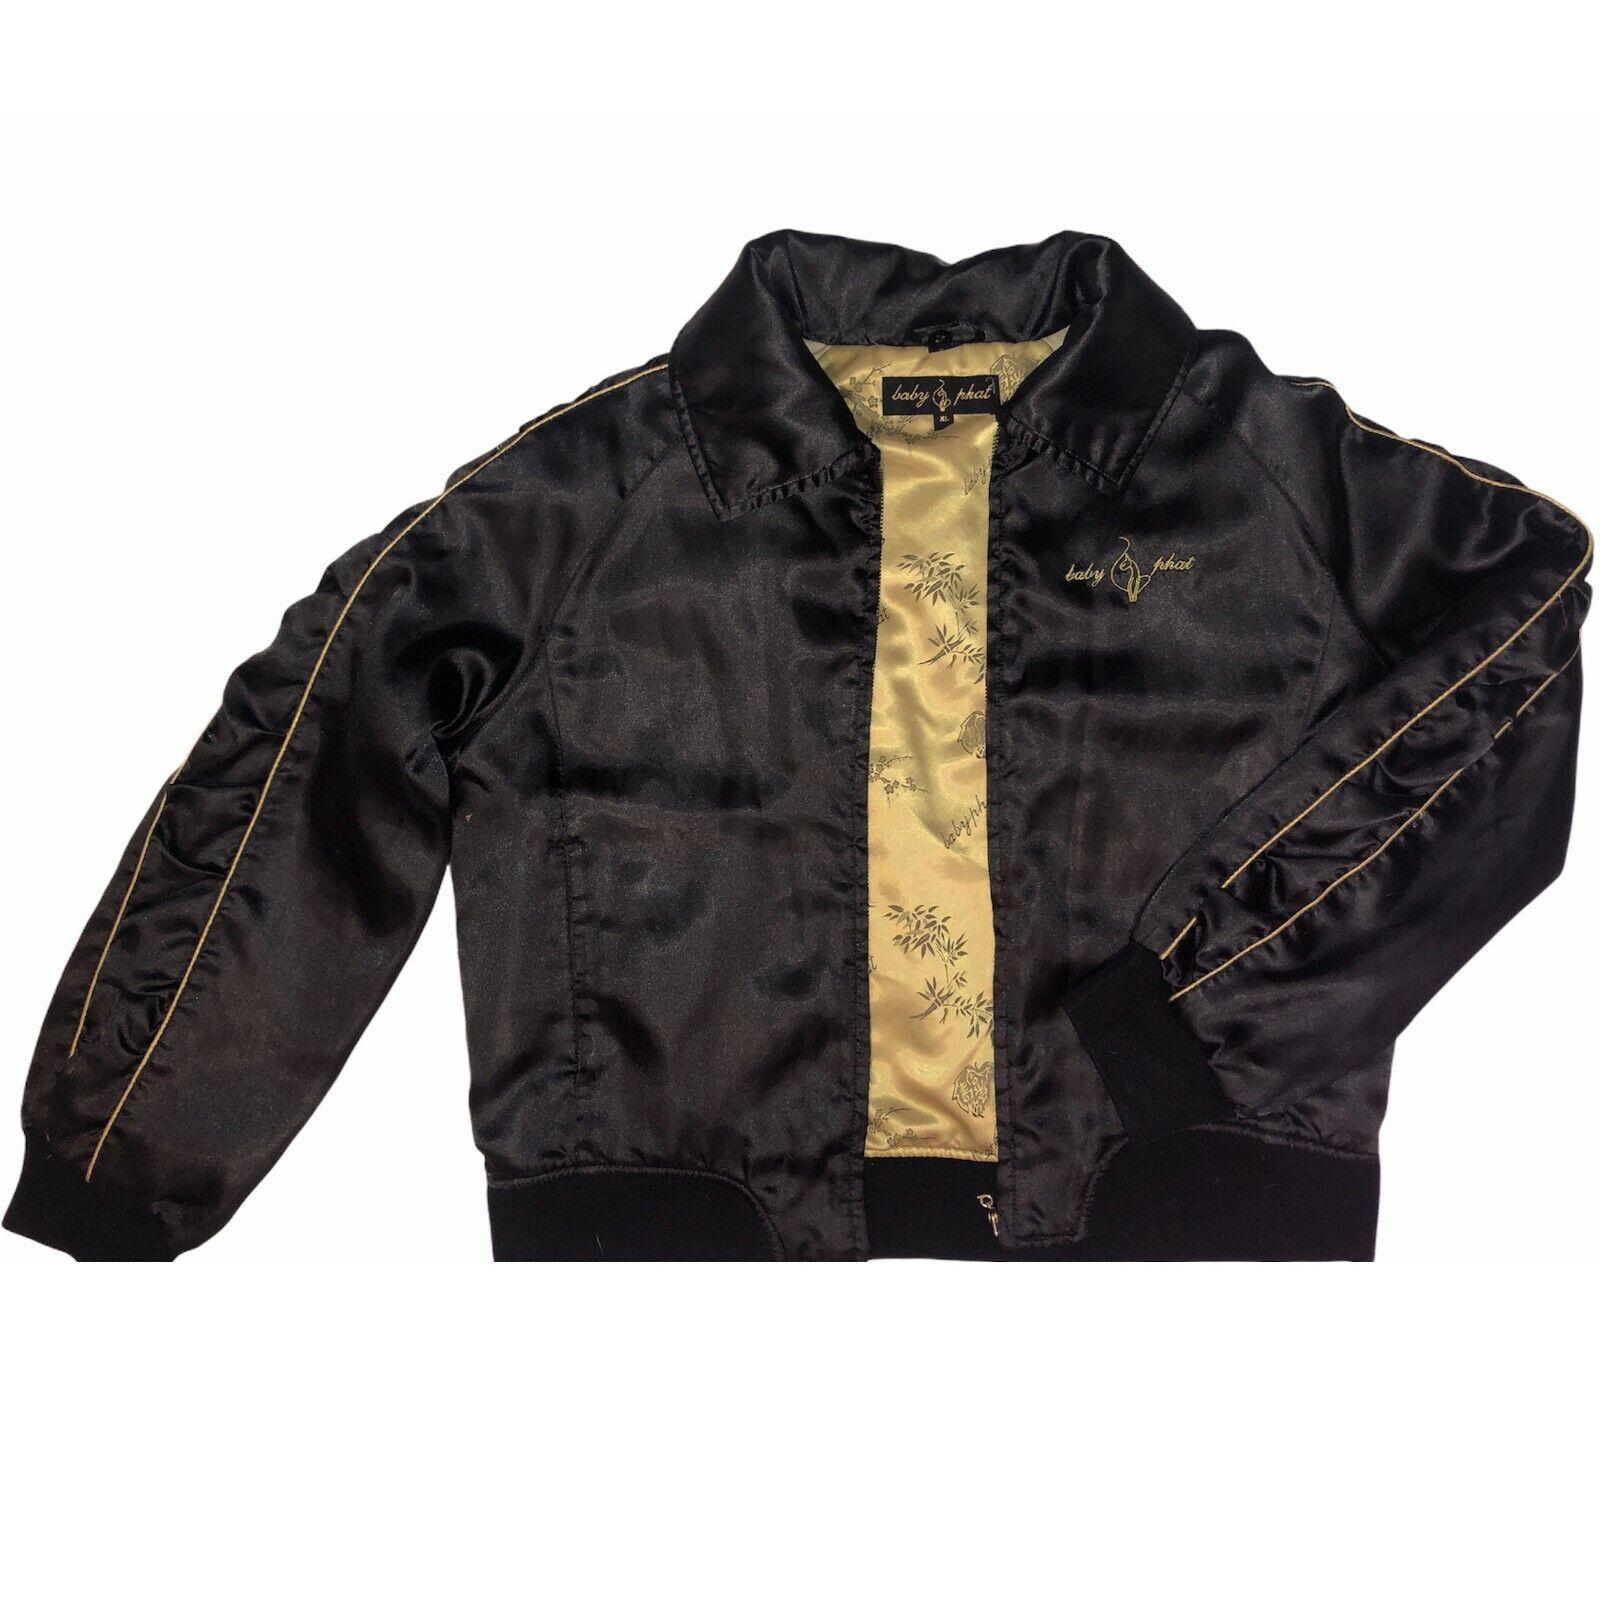 BABY PHAT - Black Jacket